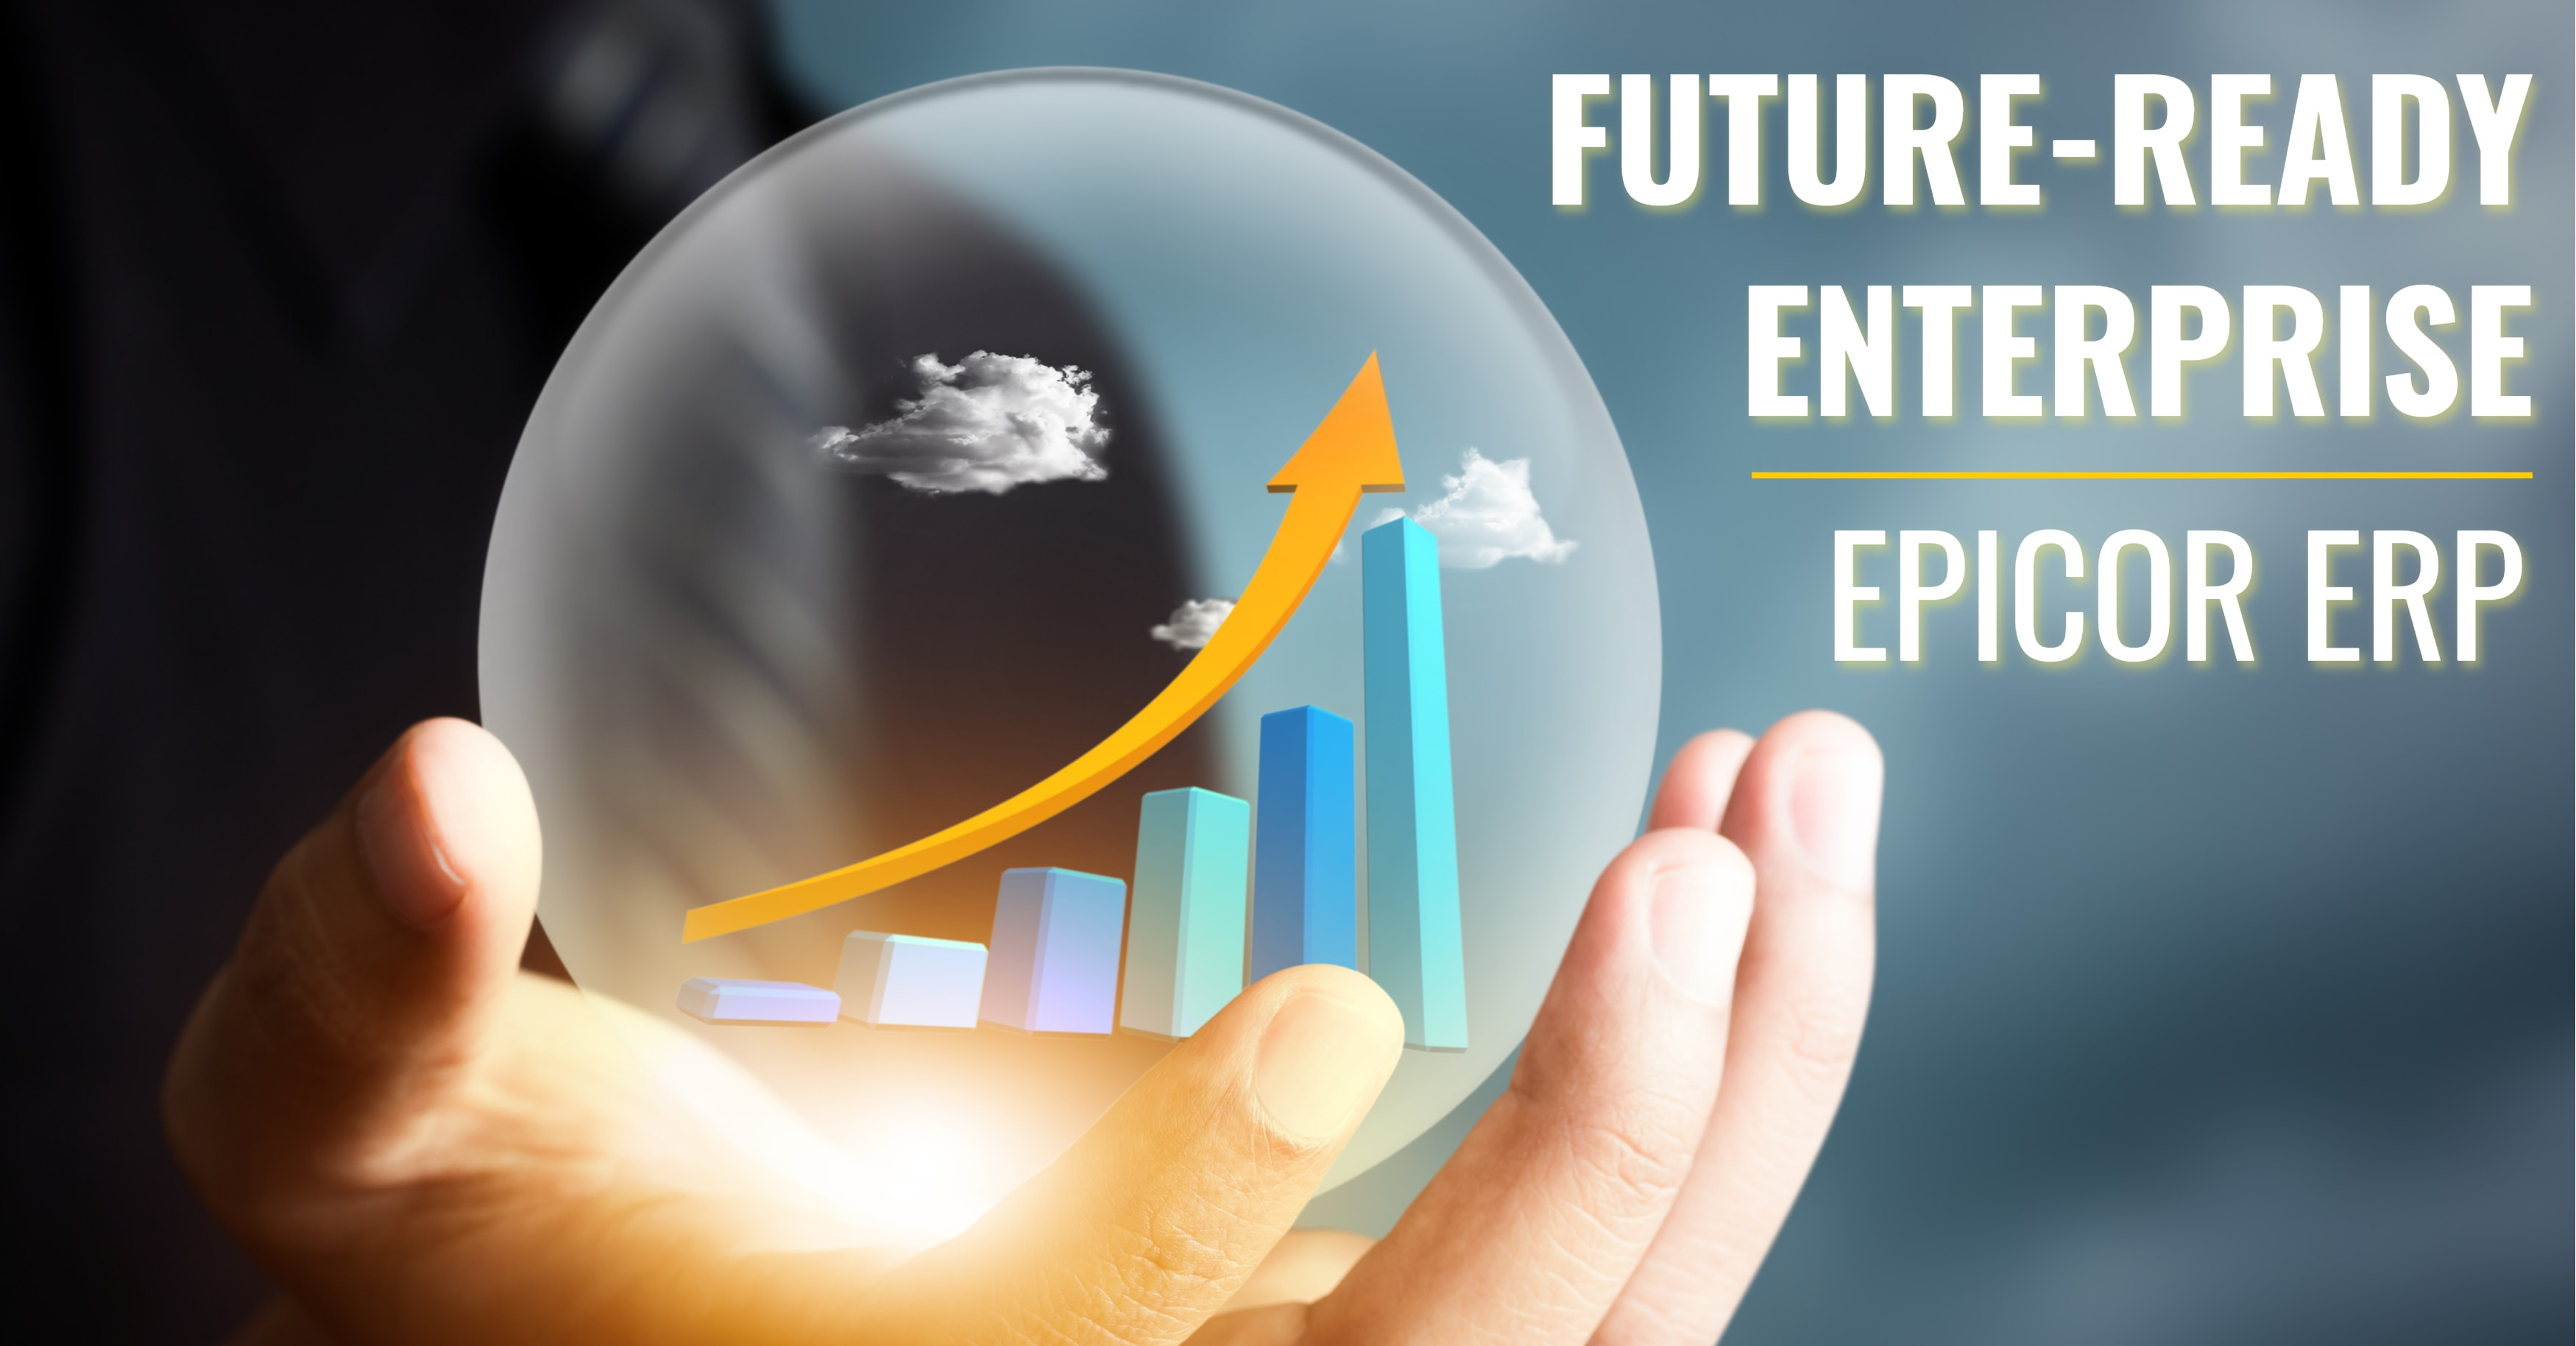 Epicor ERP Future